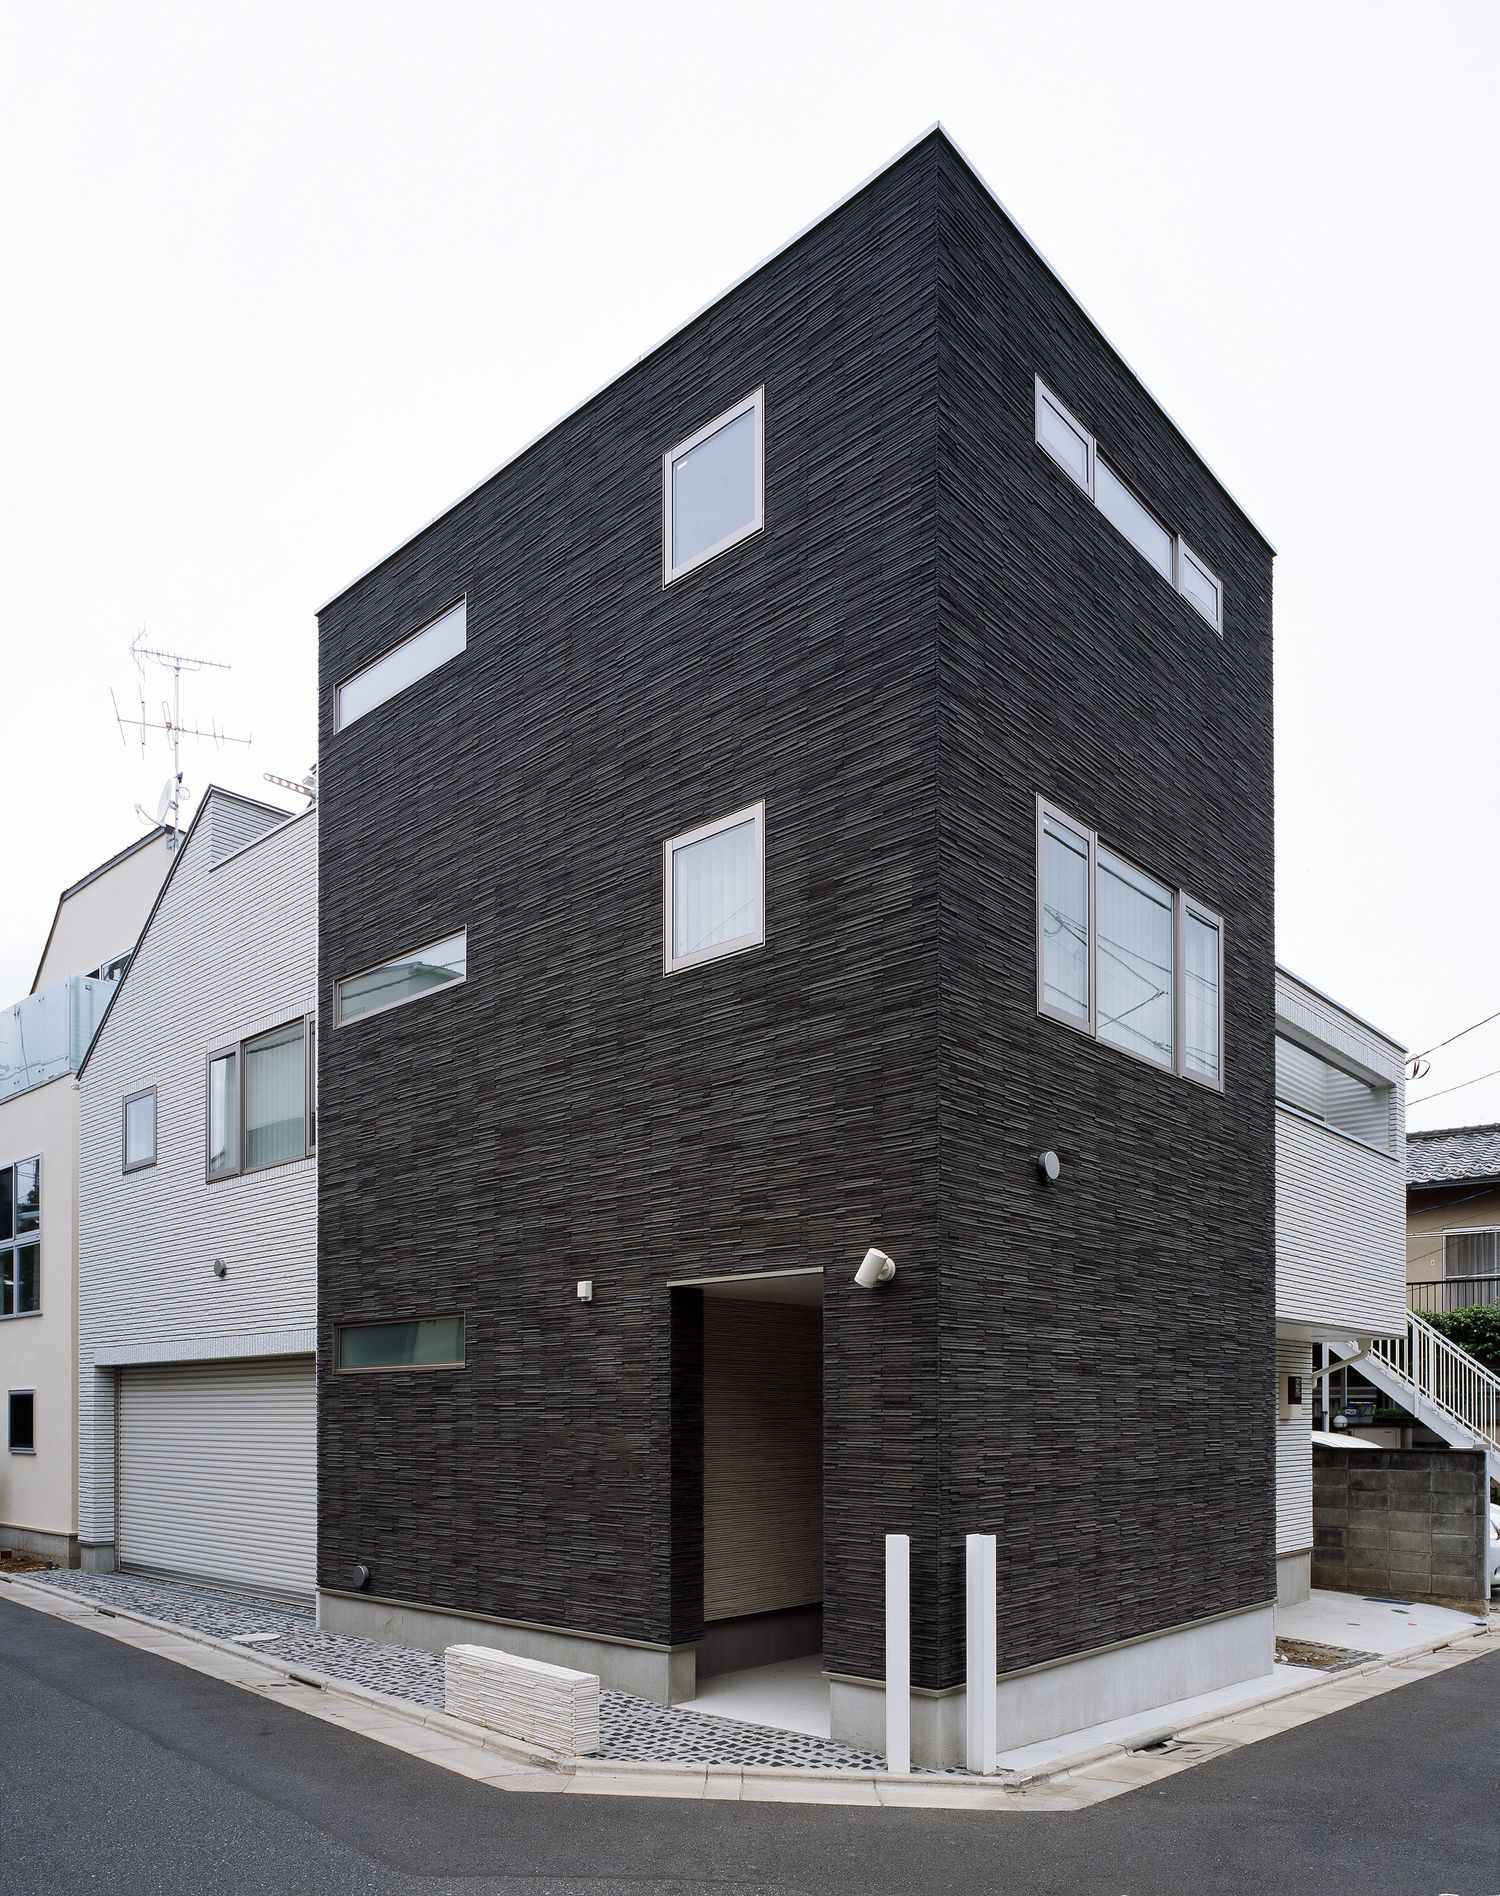 注文住宅・デザイン住宅建築実例_外観